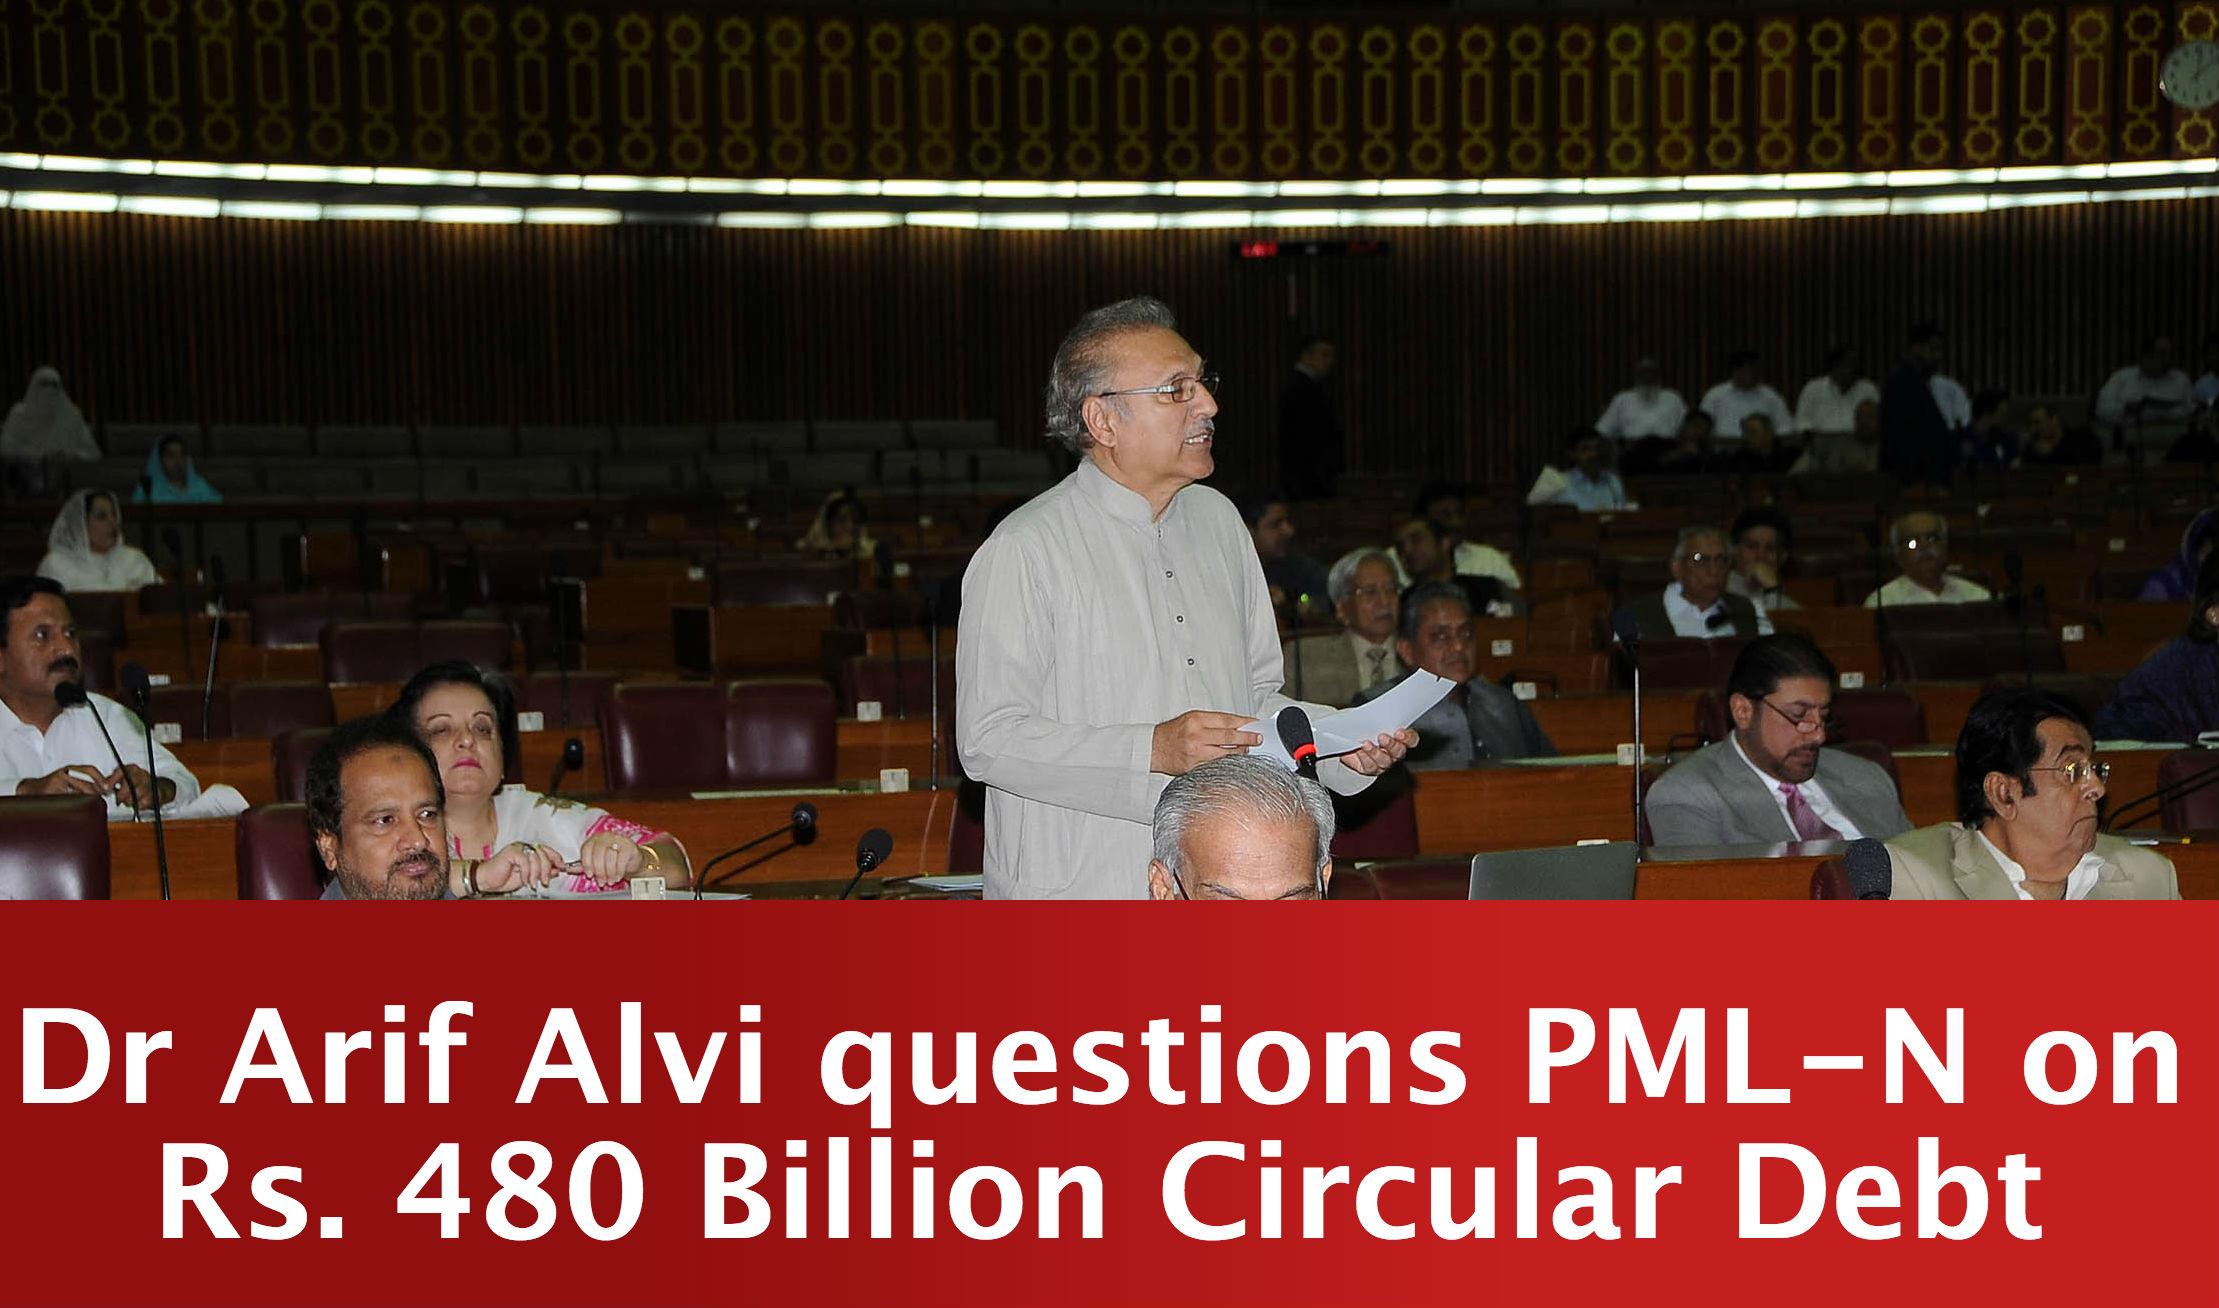 Arif_Quizzes_PML_on_Circular_debt.jpg